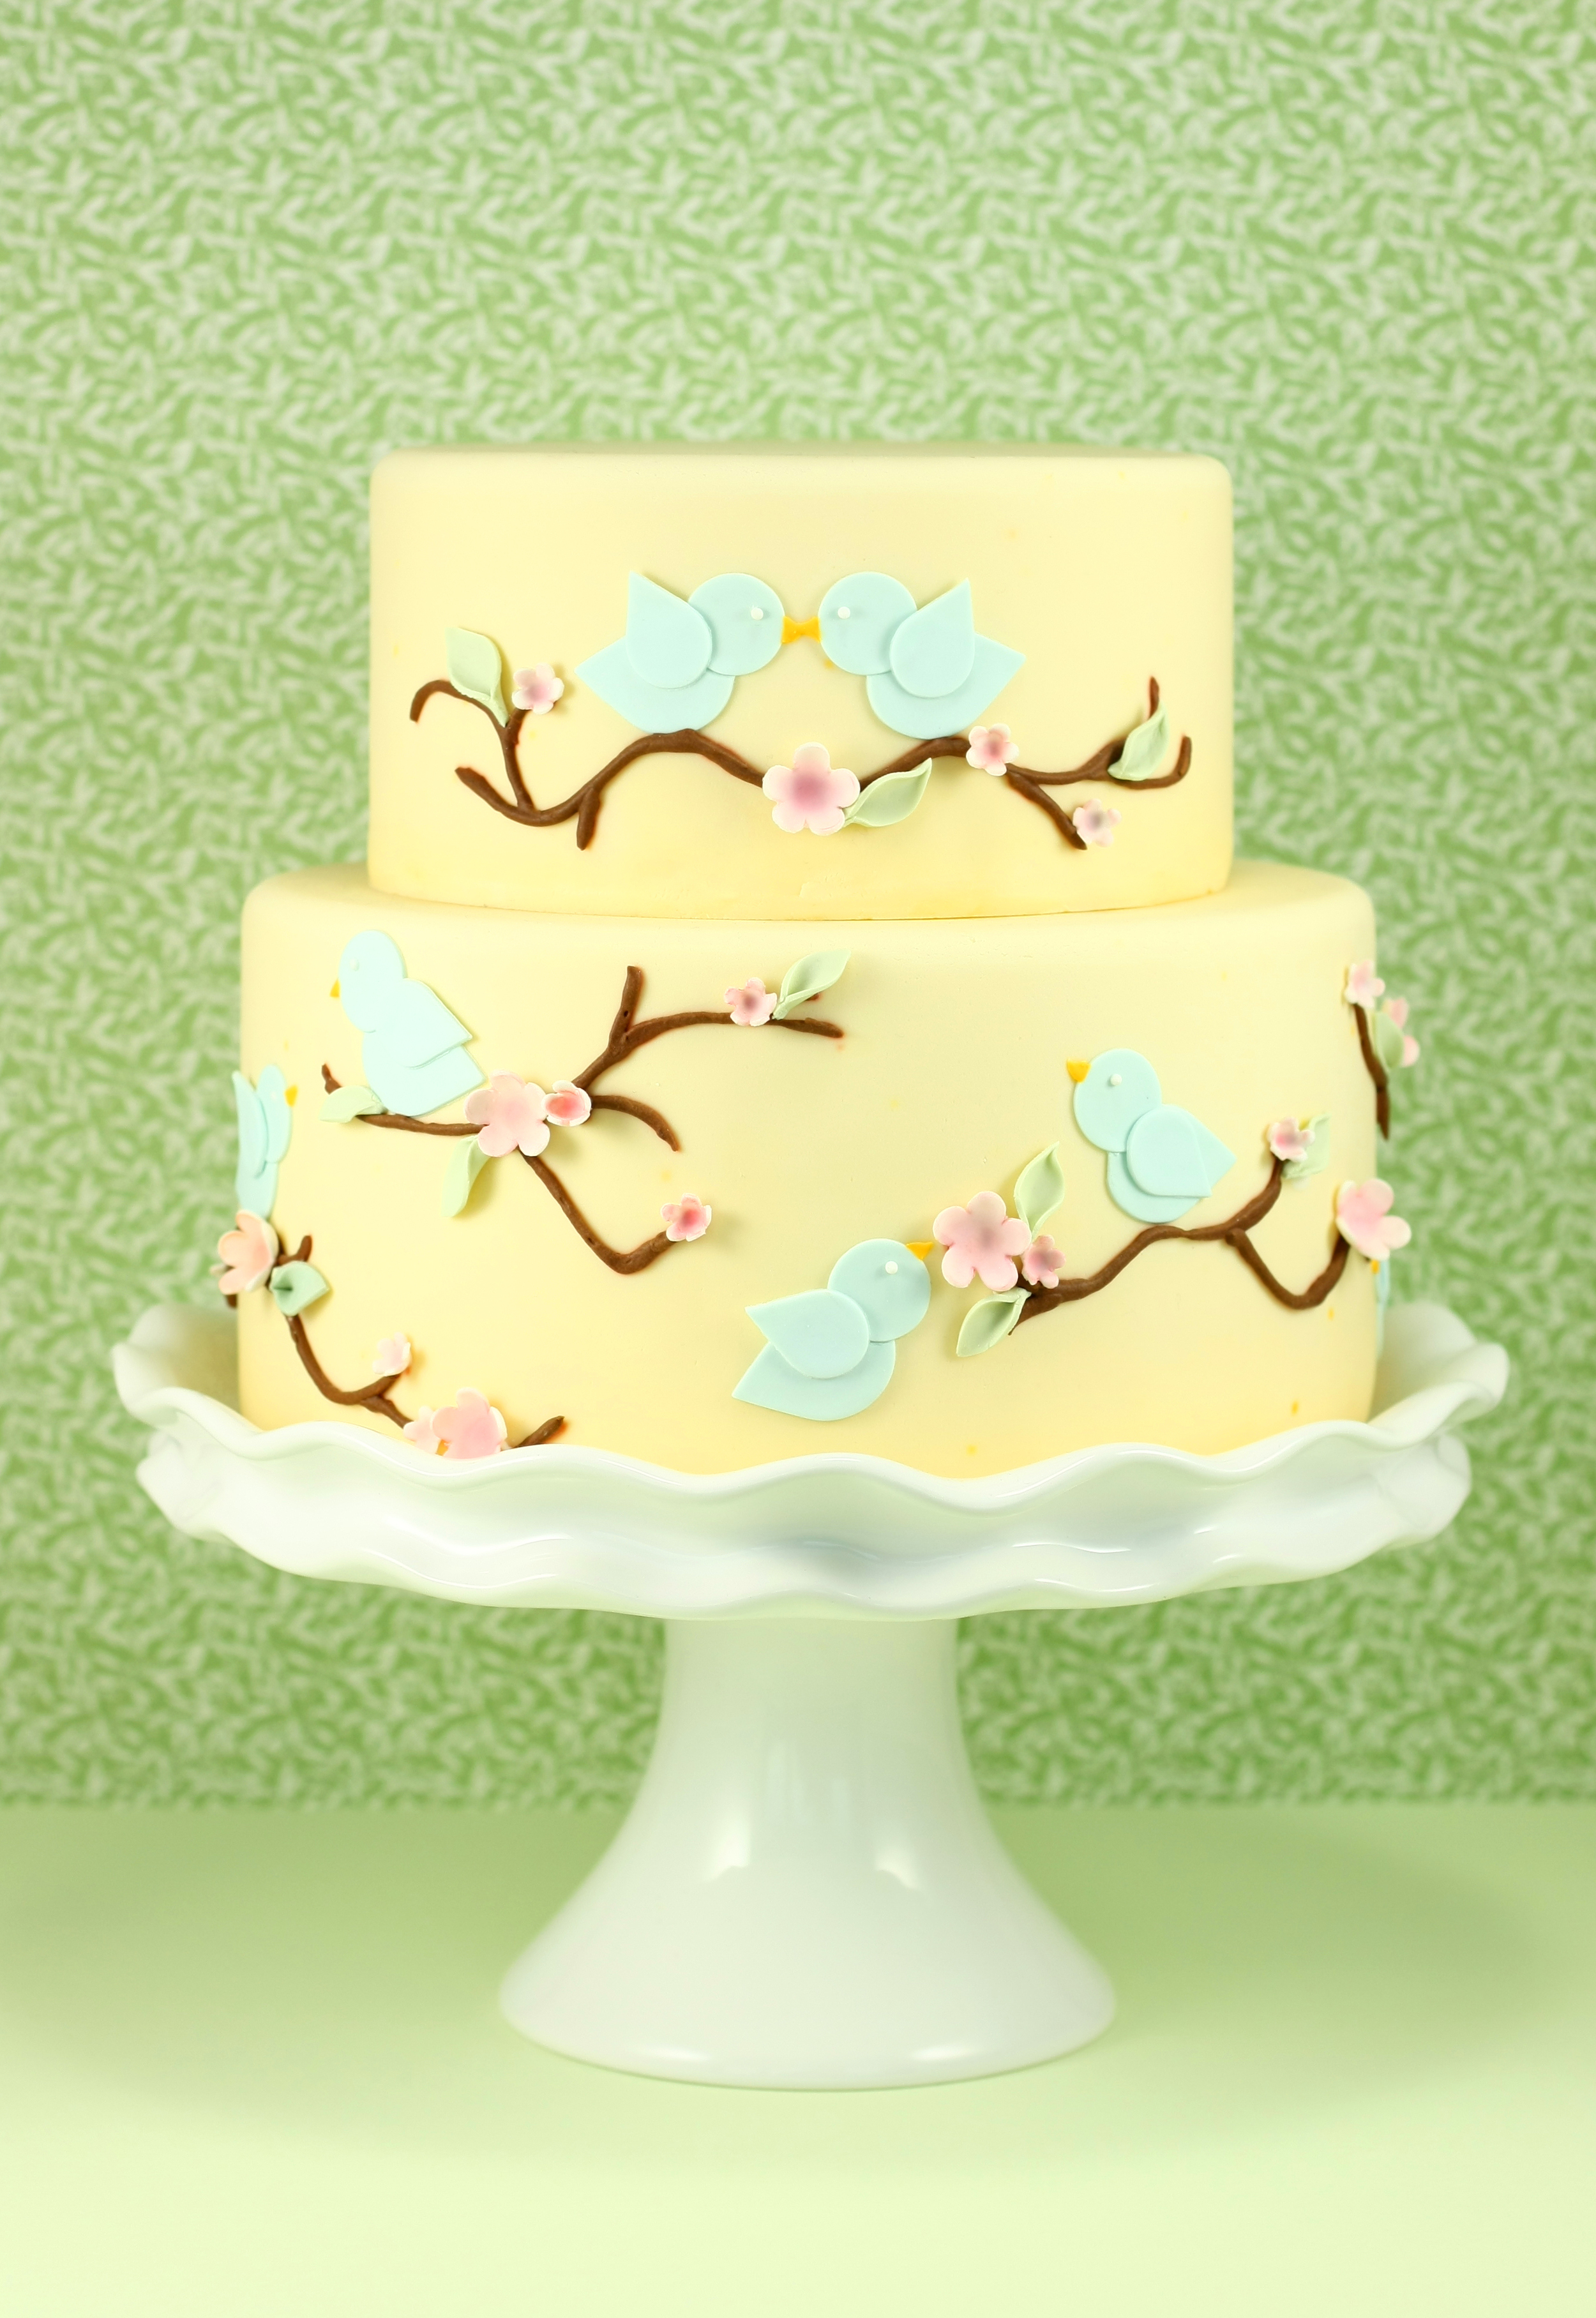 eatcakebemerry_lovebirds_cake.jpg